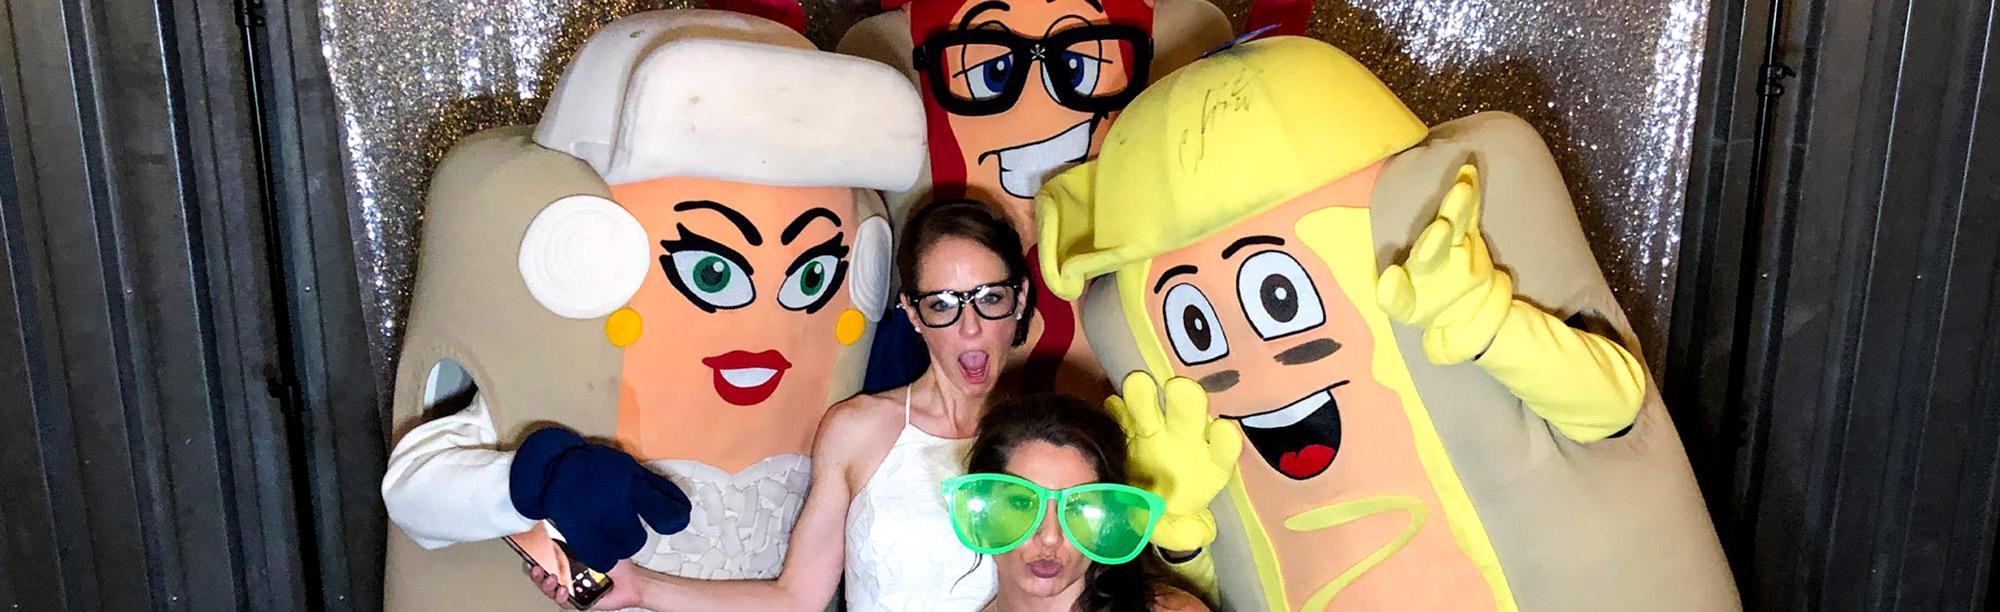 Cleveland Indian's hot dog mascots at wedding